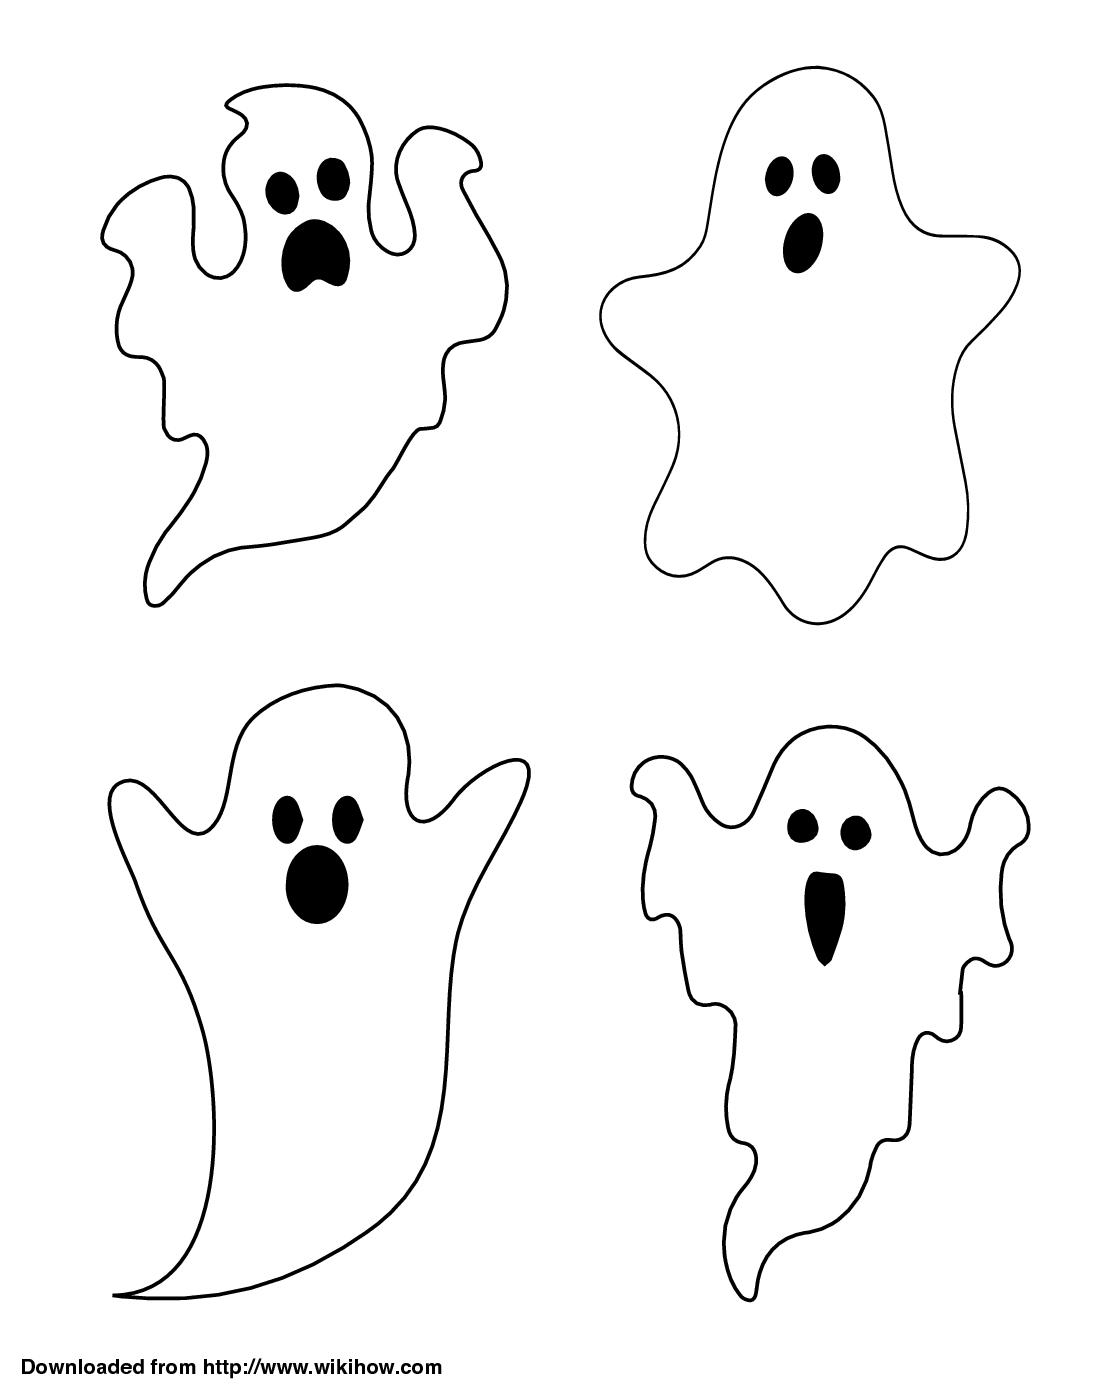 Draw A Ghost Bricolage Halloween Halloween Templates Halloween